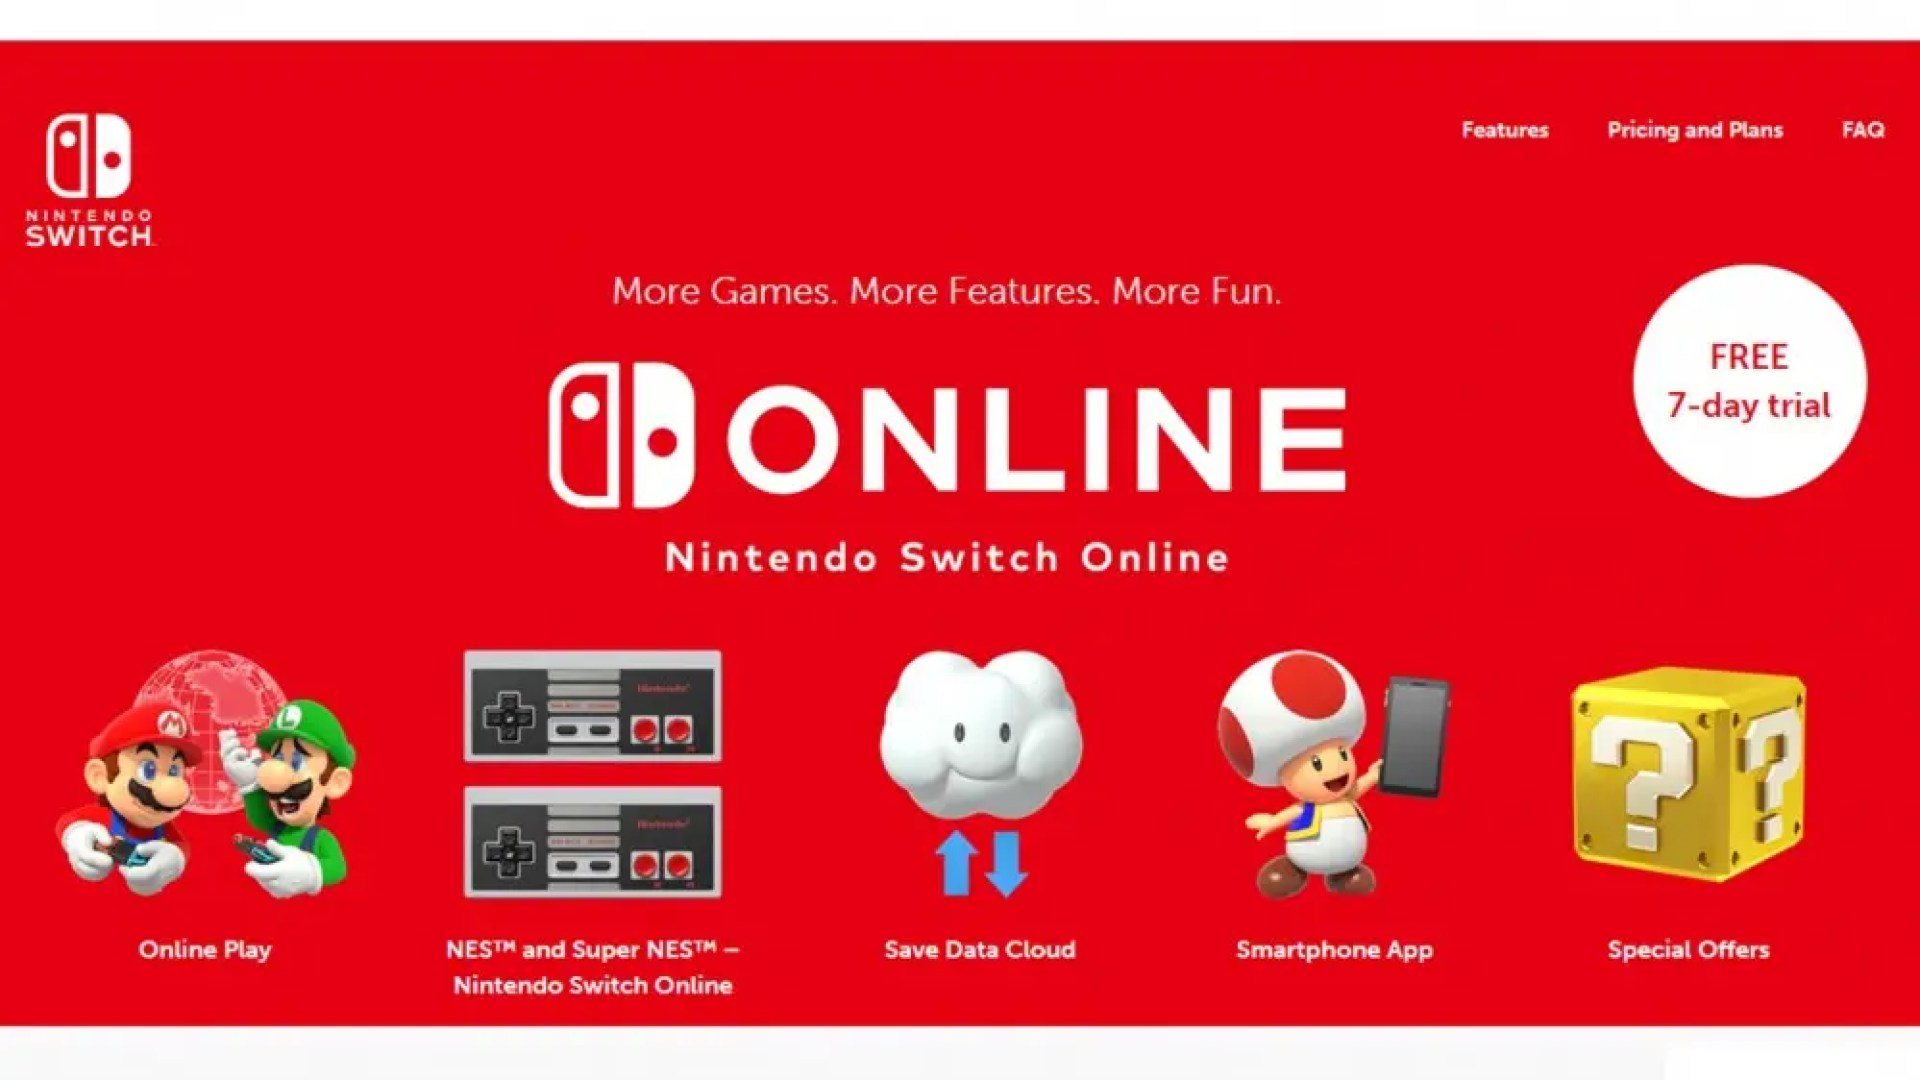 A screenshot from the Nintendo Switch online website